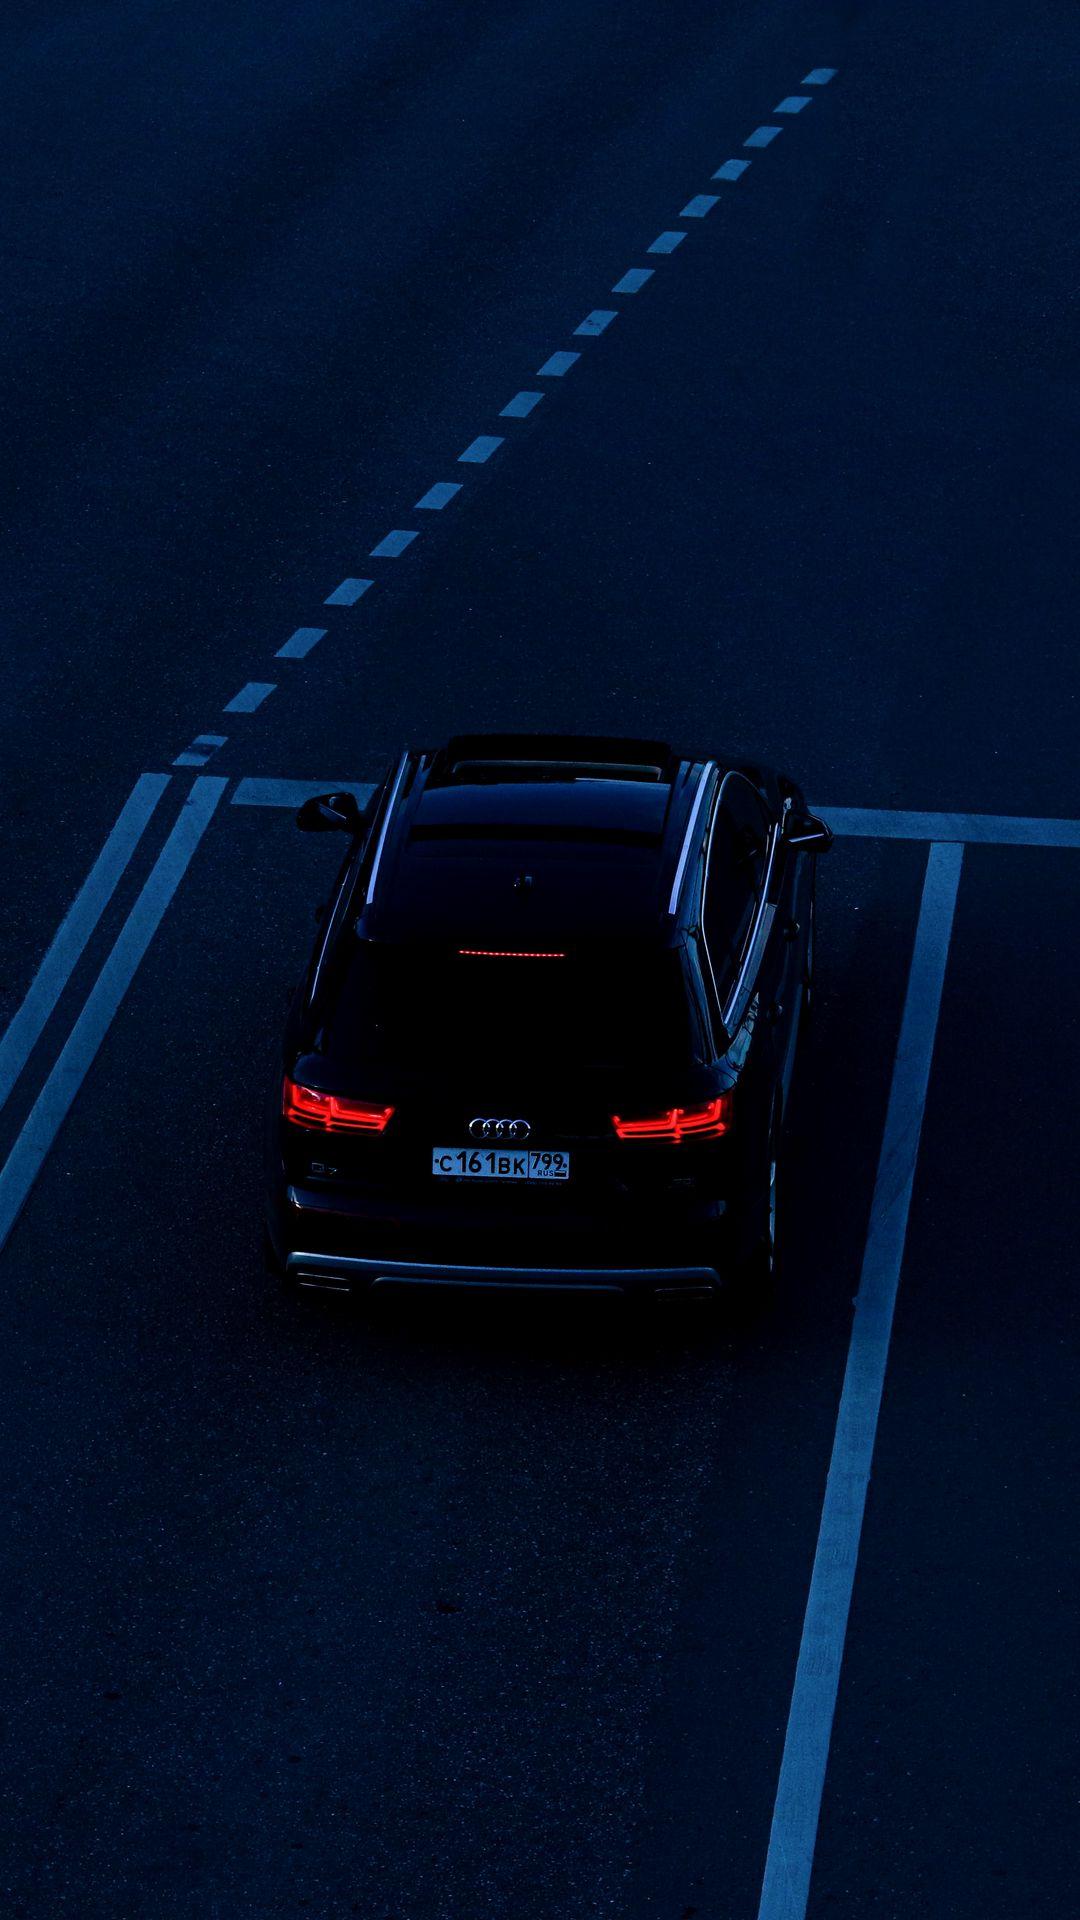 Audi.com Background Audi Wallpapers Download